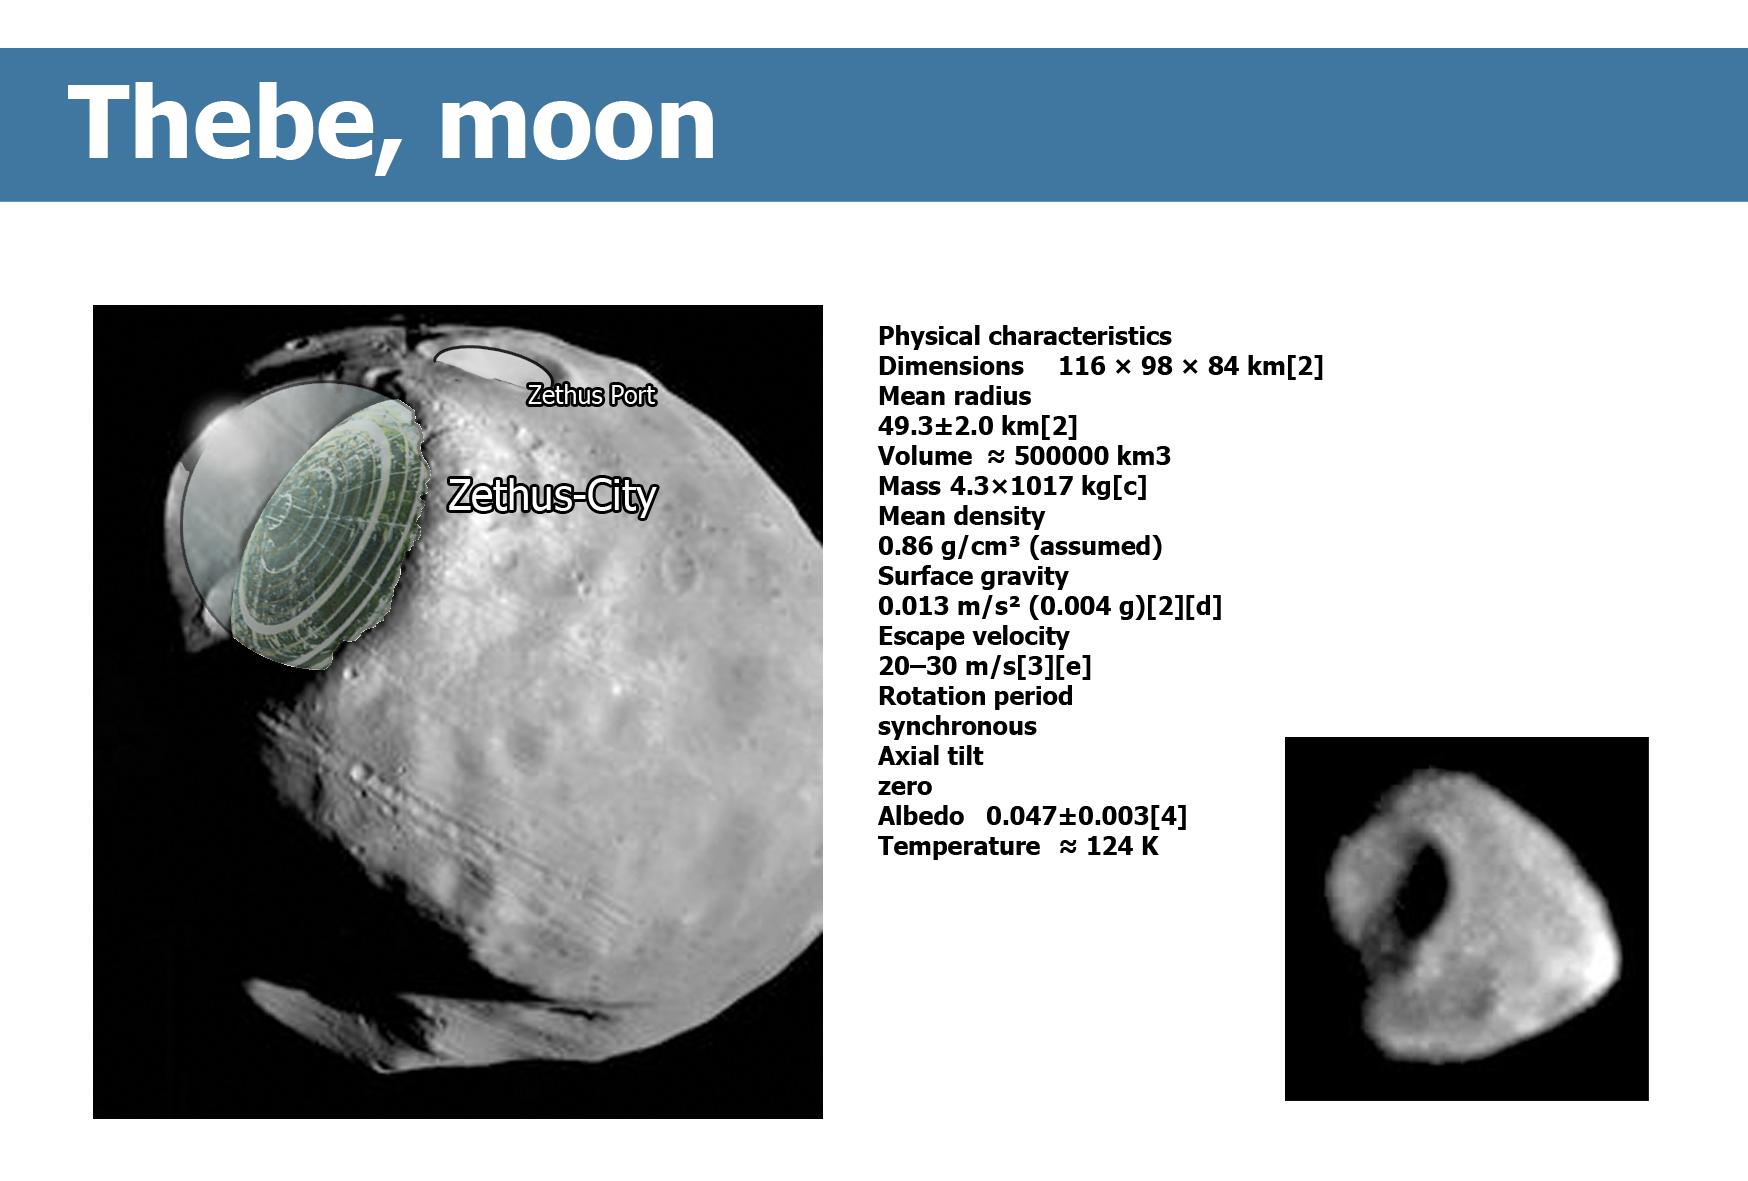 jupiter moon thebe - photo #14